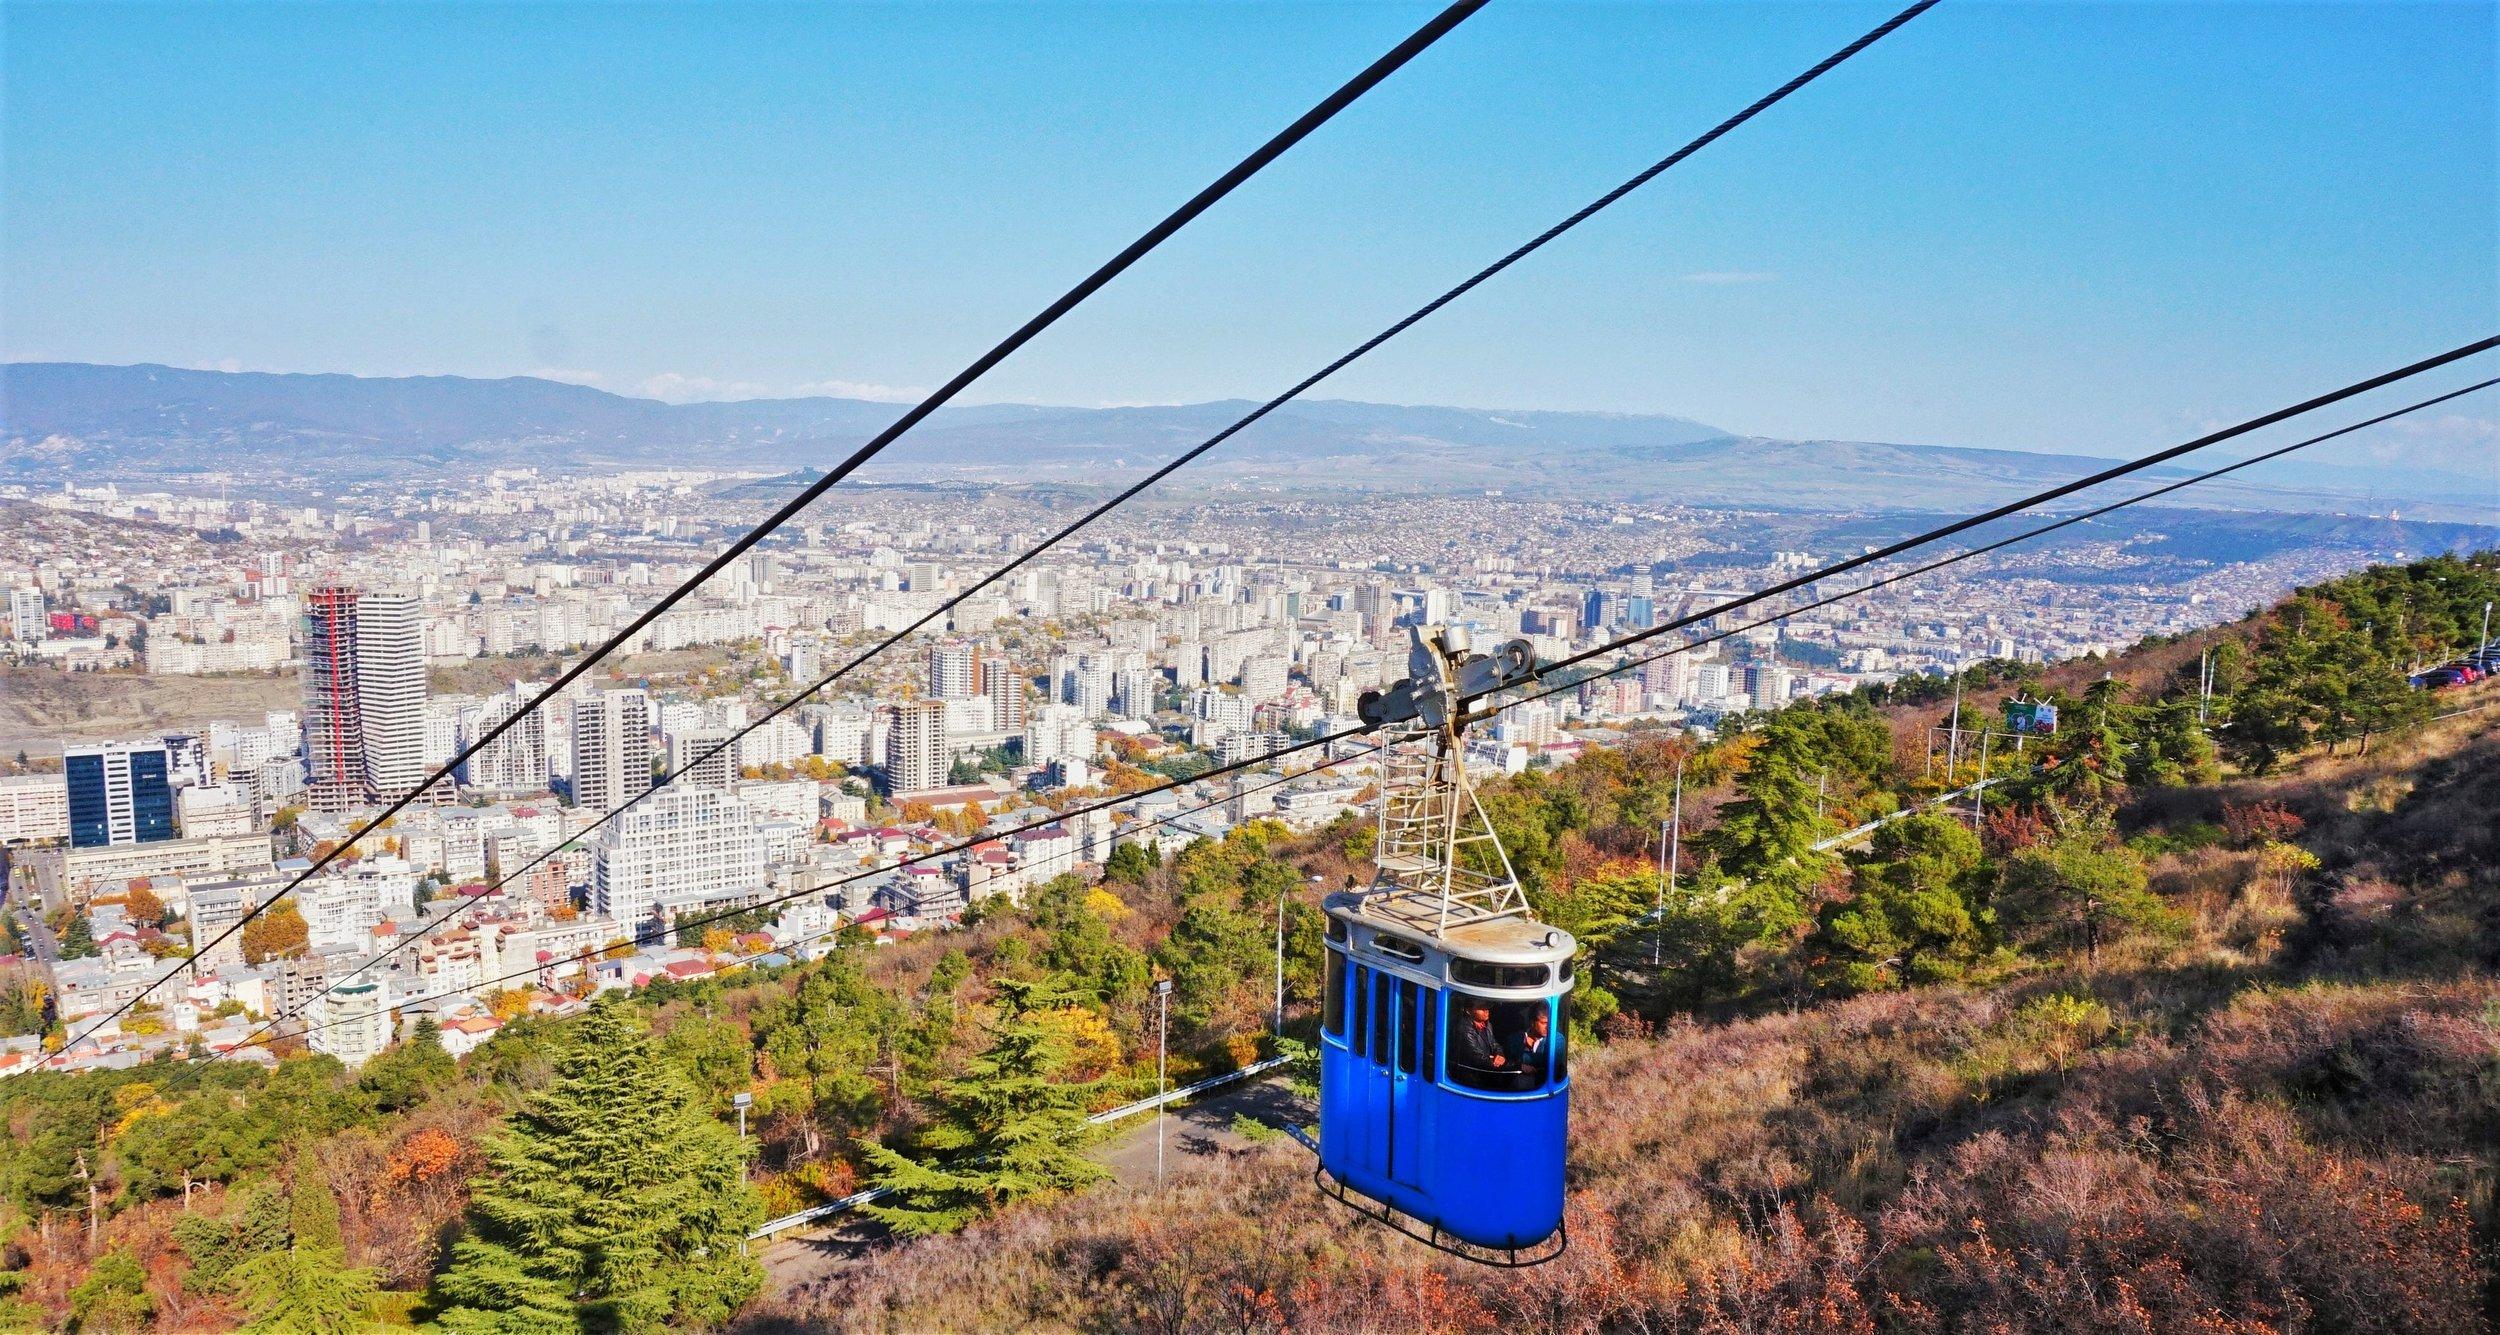 cable car in tbilisi georgia